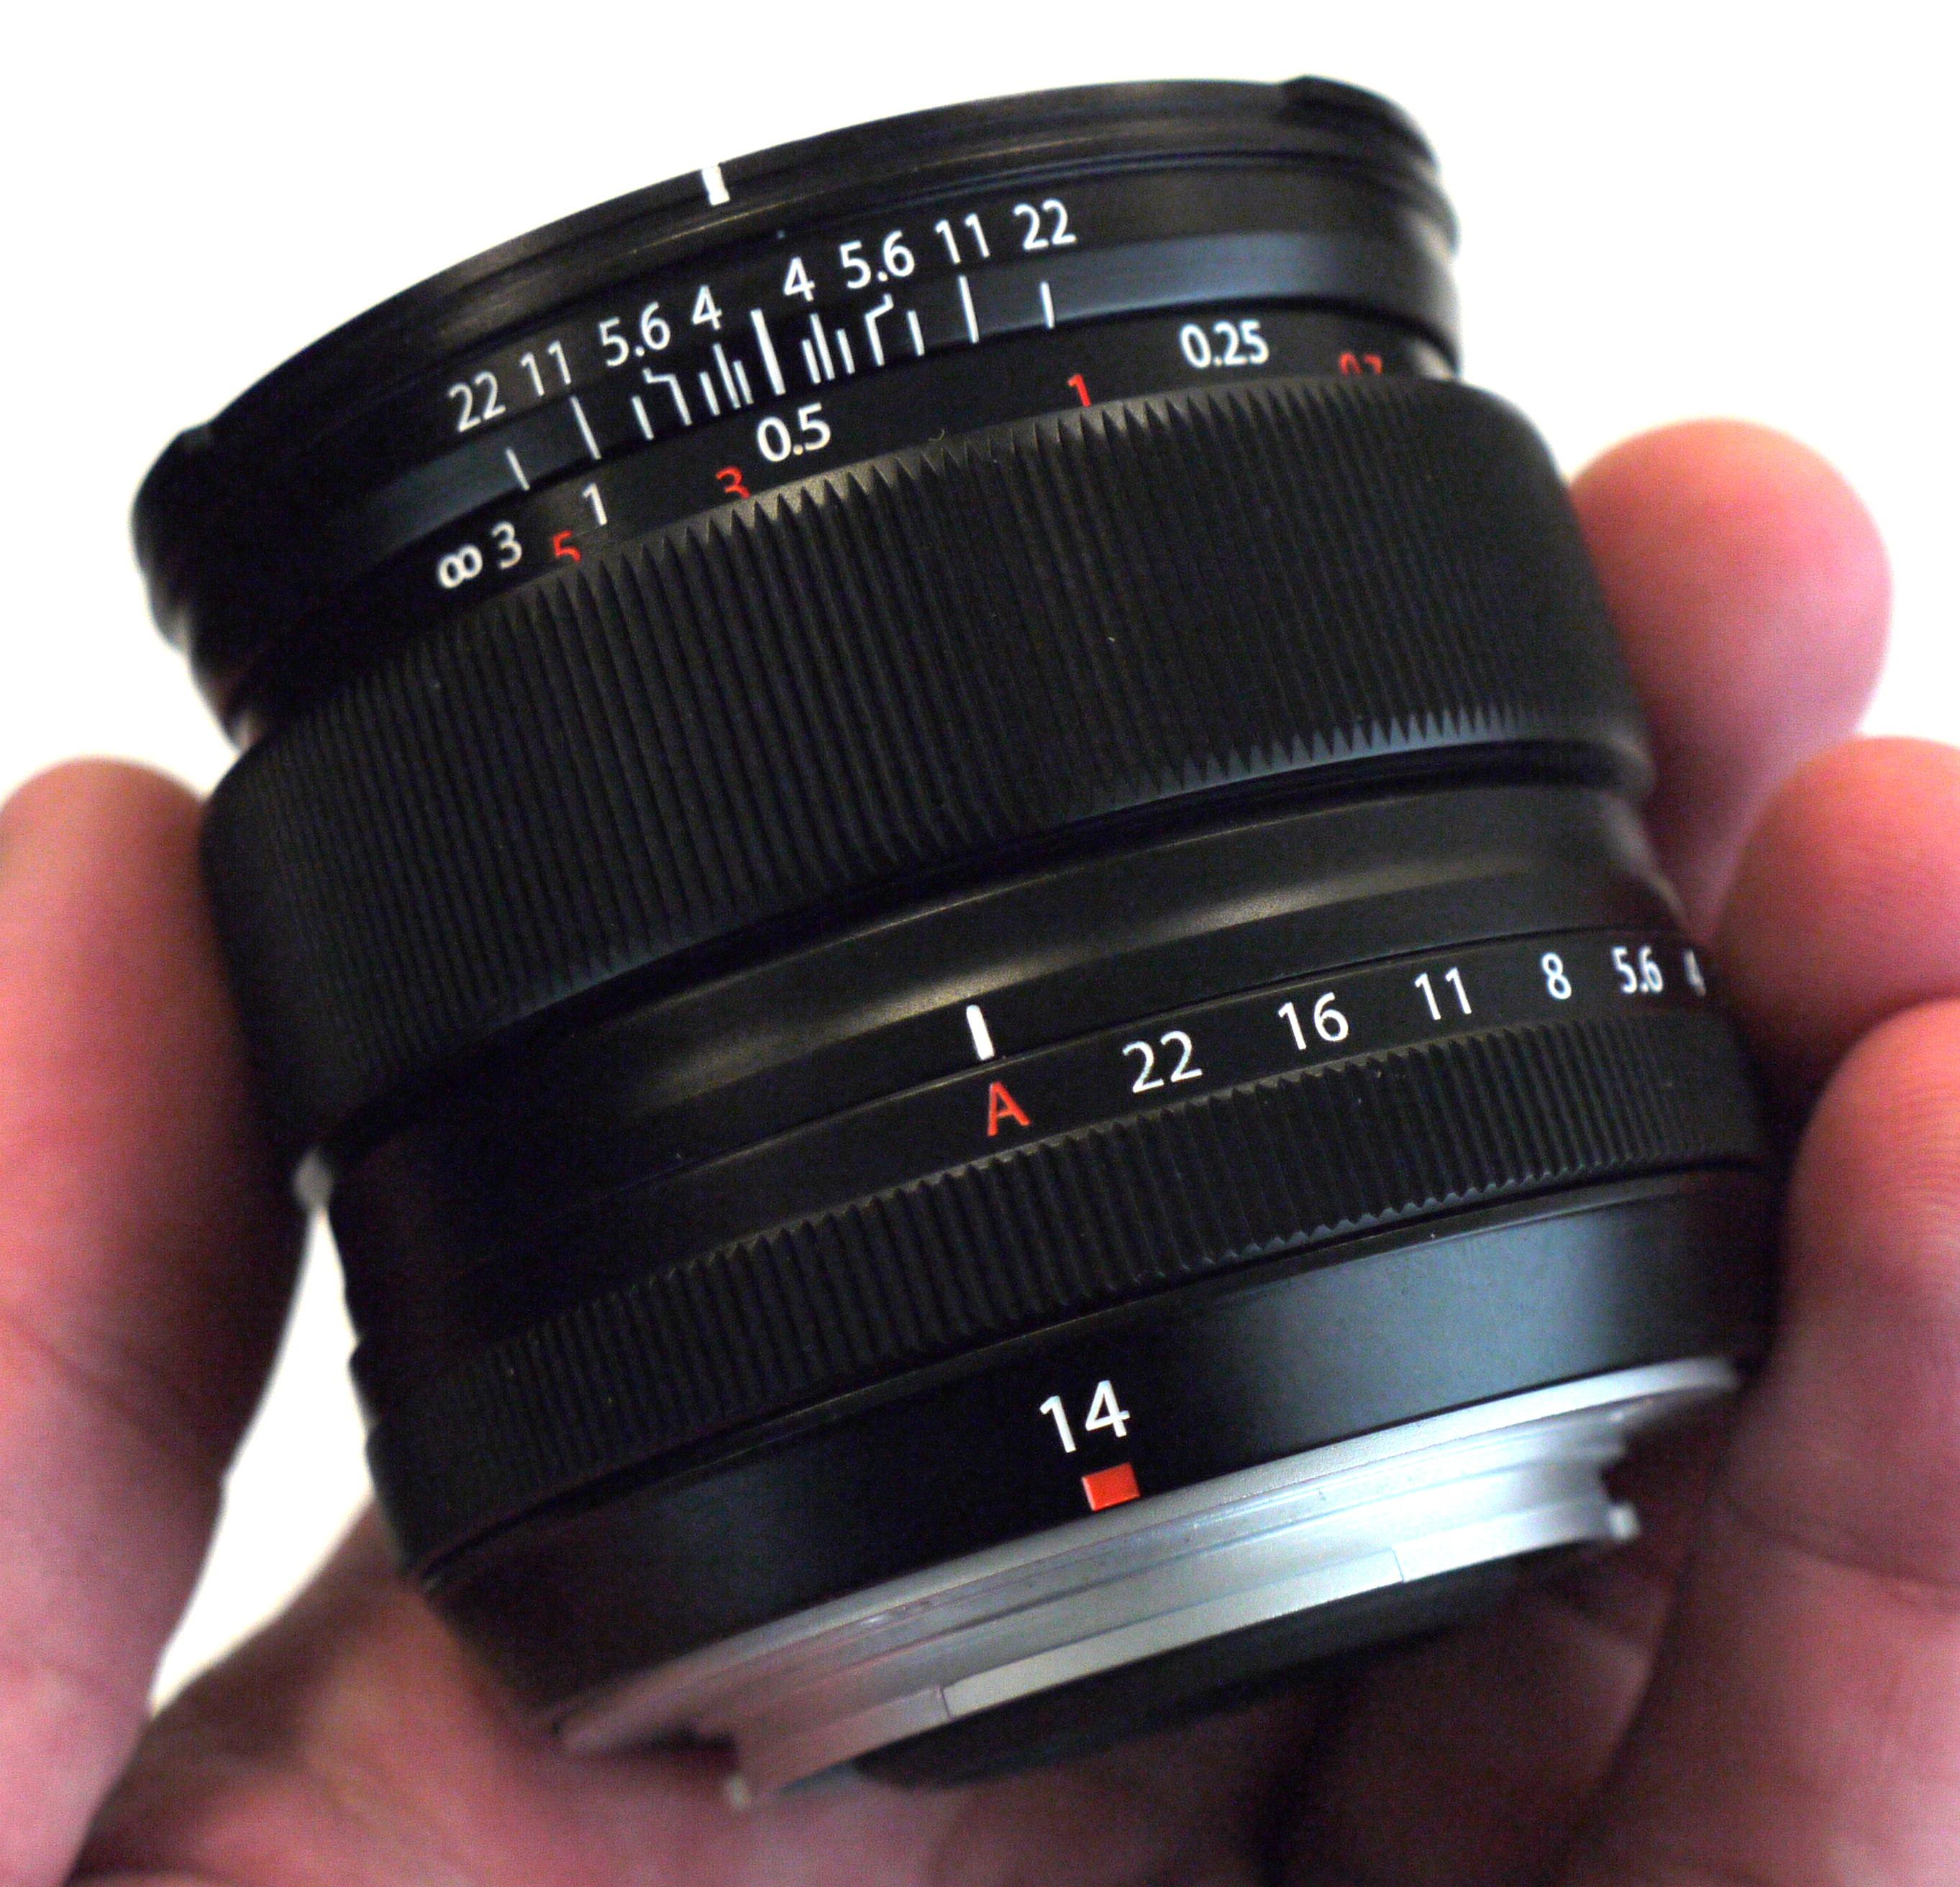 Top 13 Best Fujifilm X-Mount Lenses Reviewed | ePHOTOzine